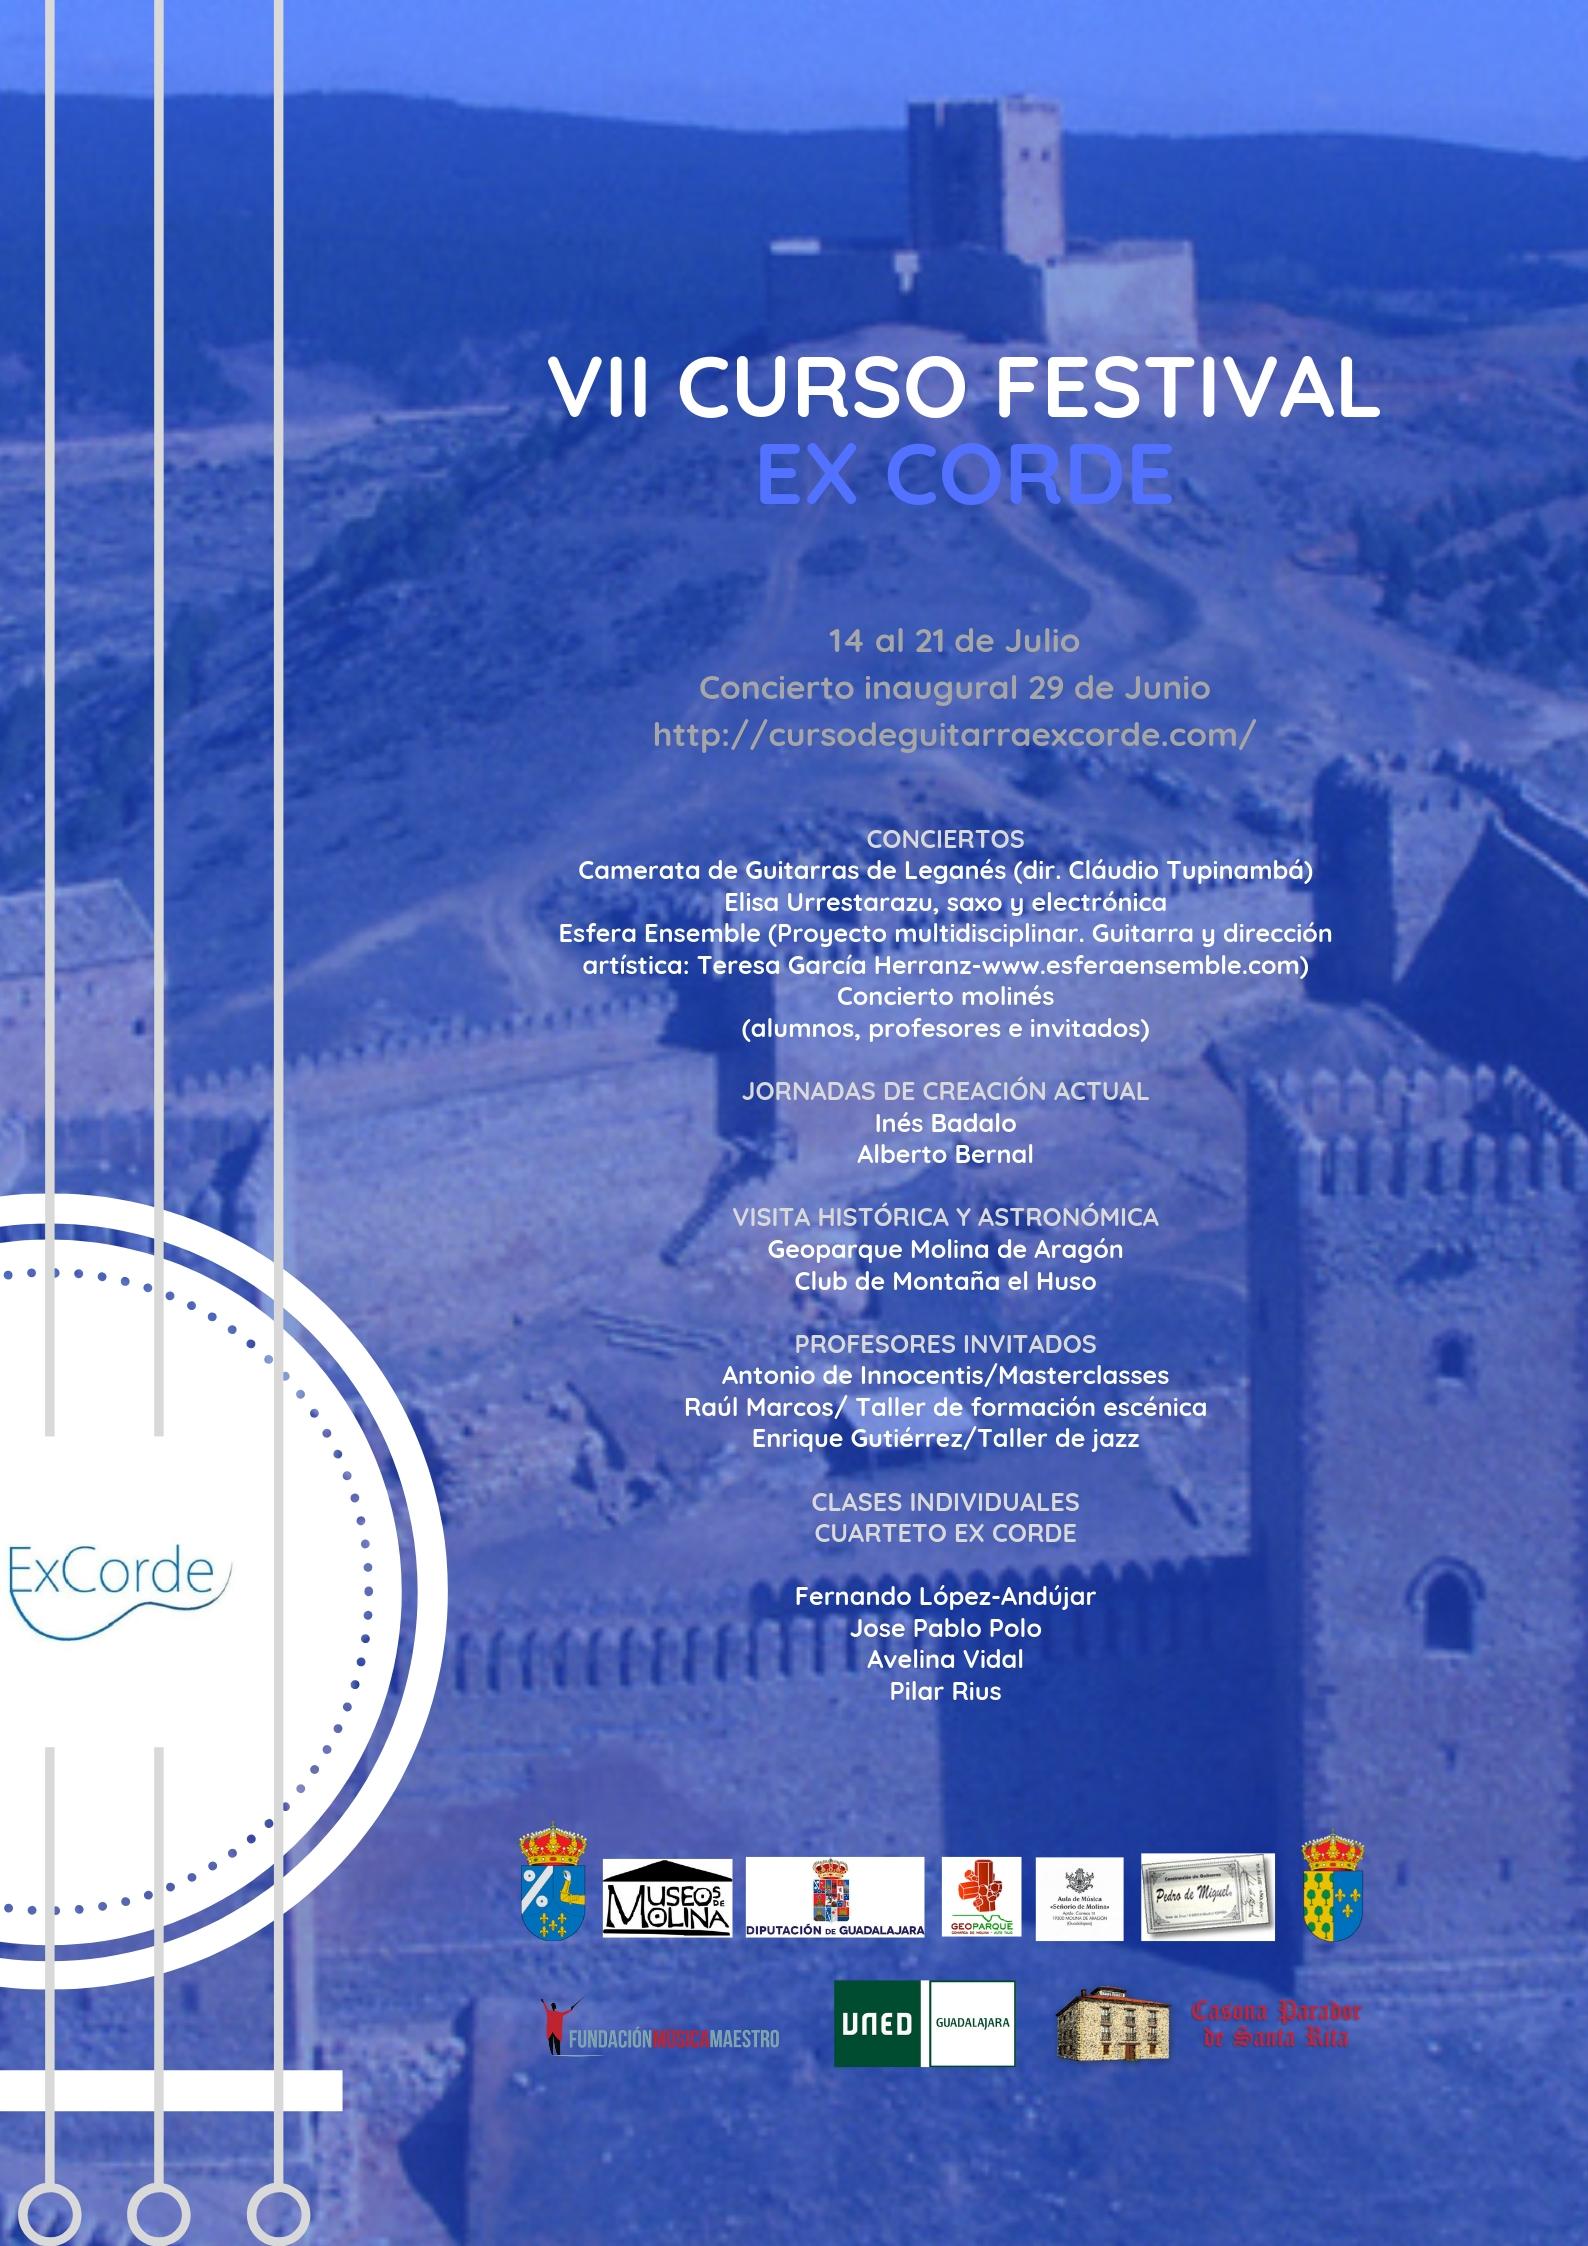 VII Curso Festival